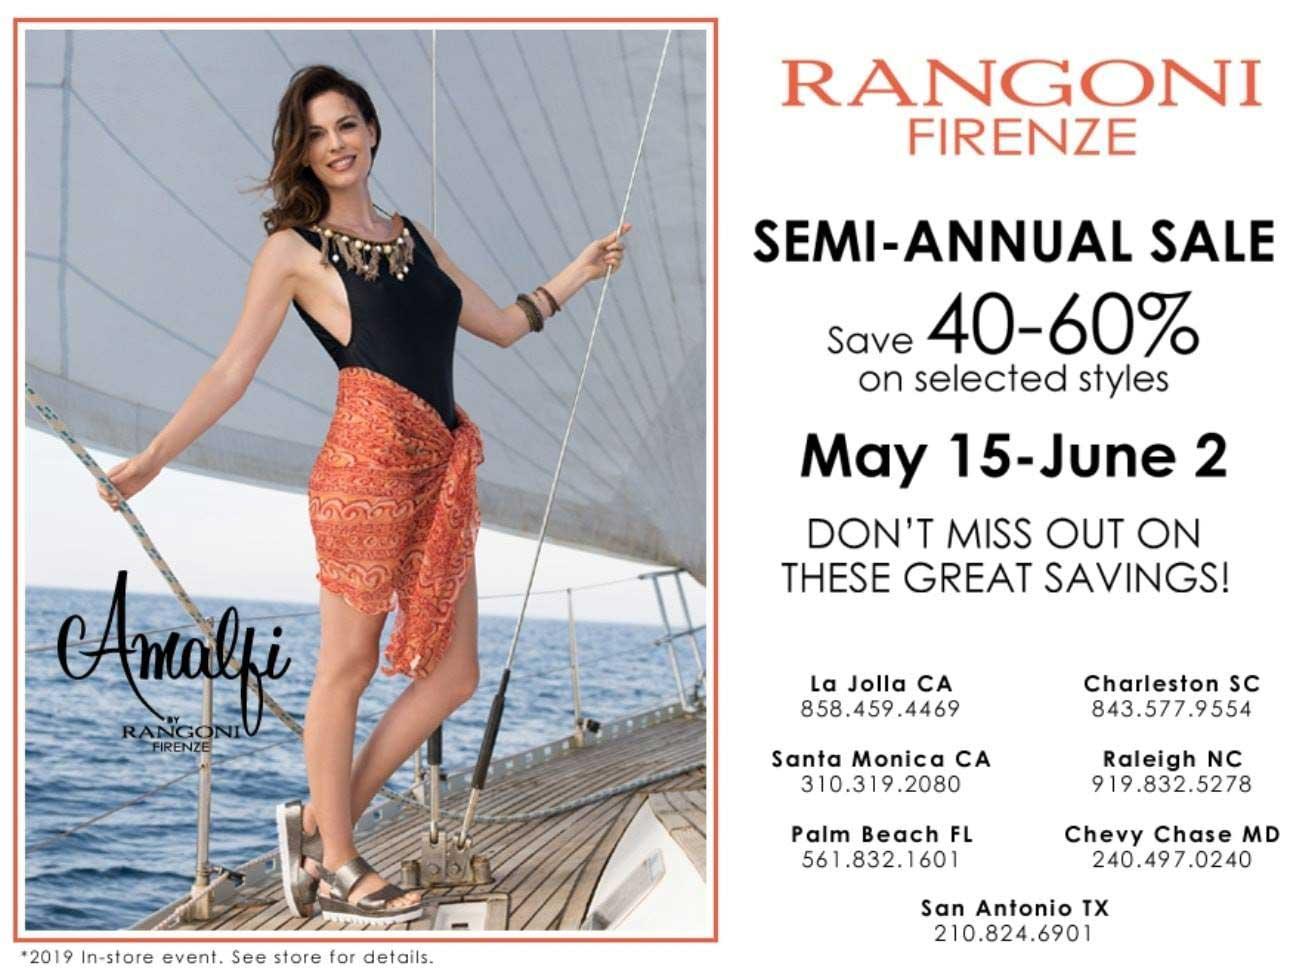 Rangoni Shoe Sale in Charleston SC. 40%-60% off selected styles. Sale ends June 2.